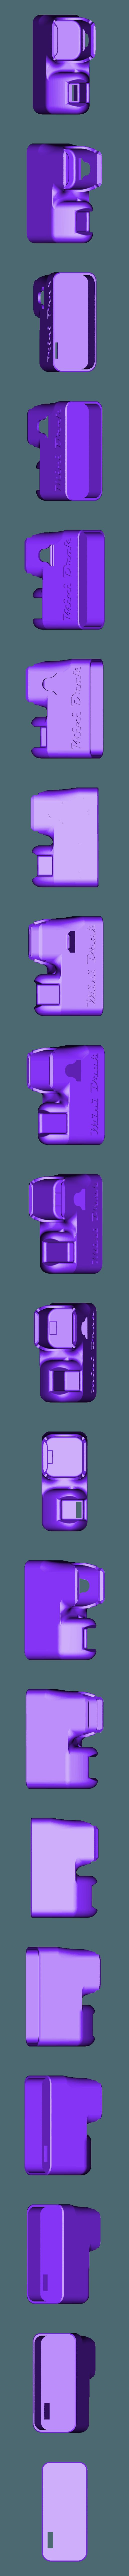 Mini_Drak_Nose_Cone.stl Descargar archivo STL gratis Cono de nariz Mini Drak • Plan para imprimir en 3D, MaxPoindexter